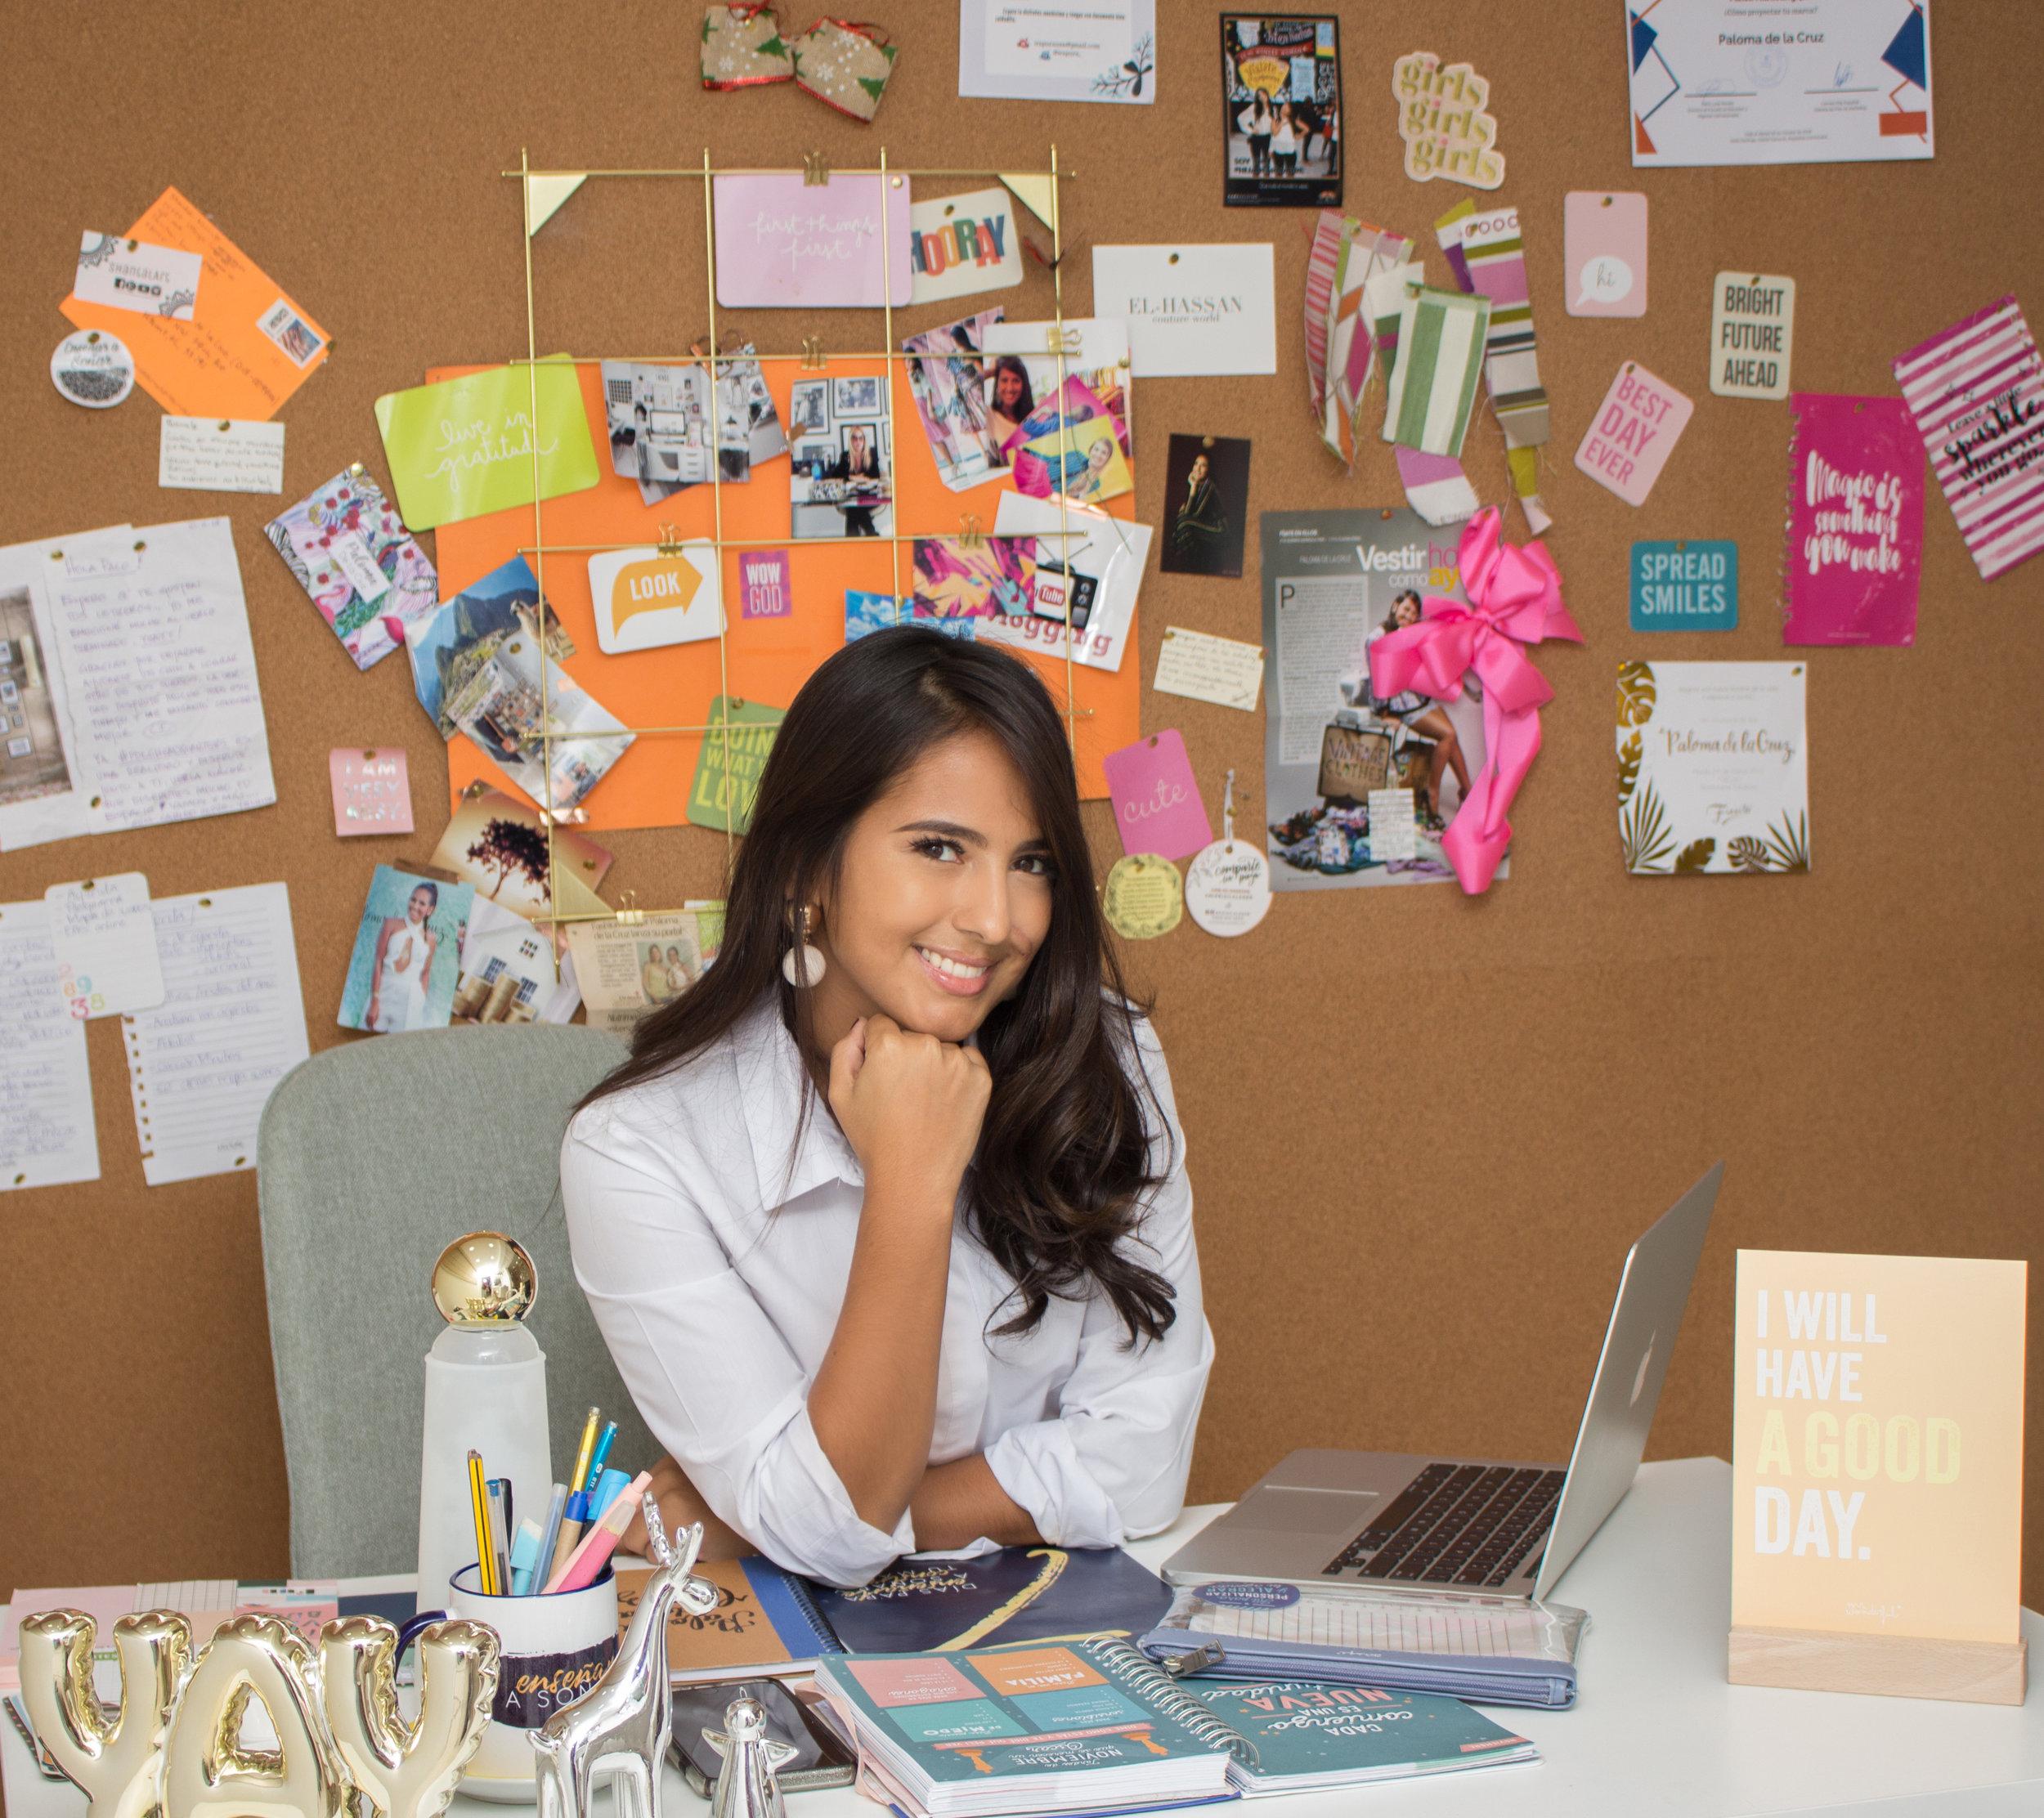 PDLC Headquarters oficina sueños metas paloma de la cruz fashion travel blogger enseñar a soñar